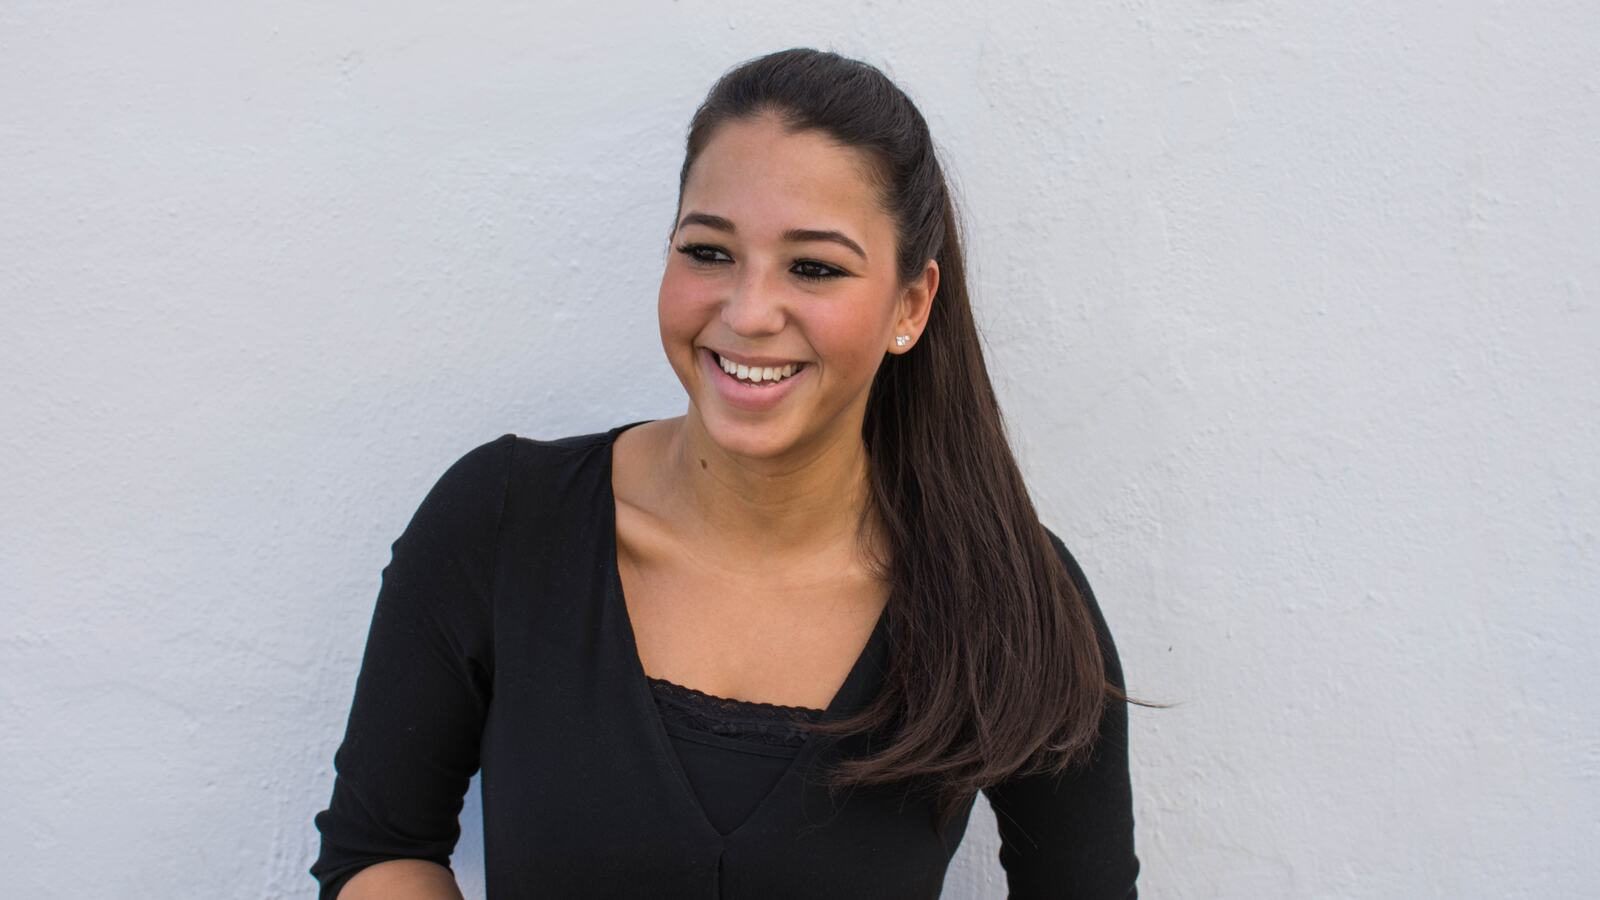 Salma El-Wardany, writer